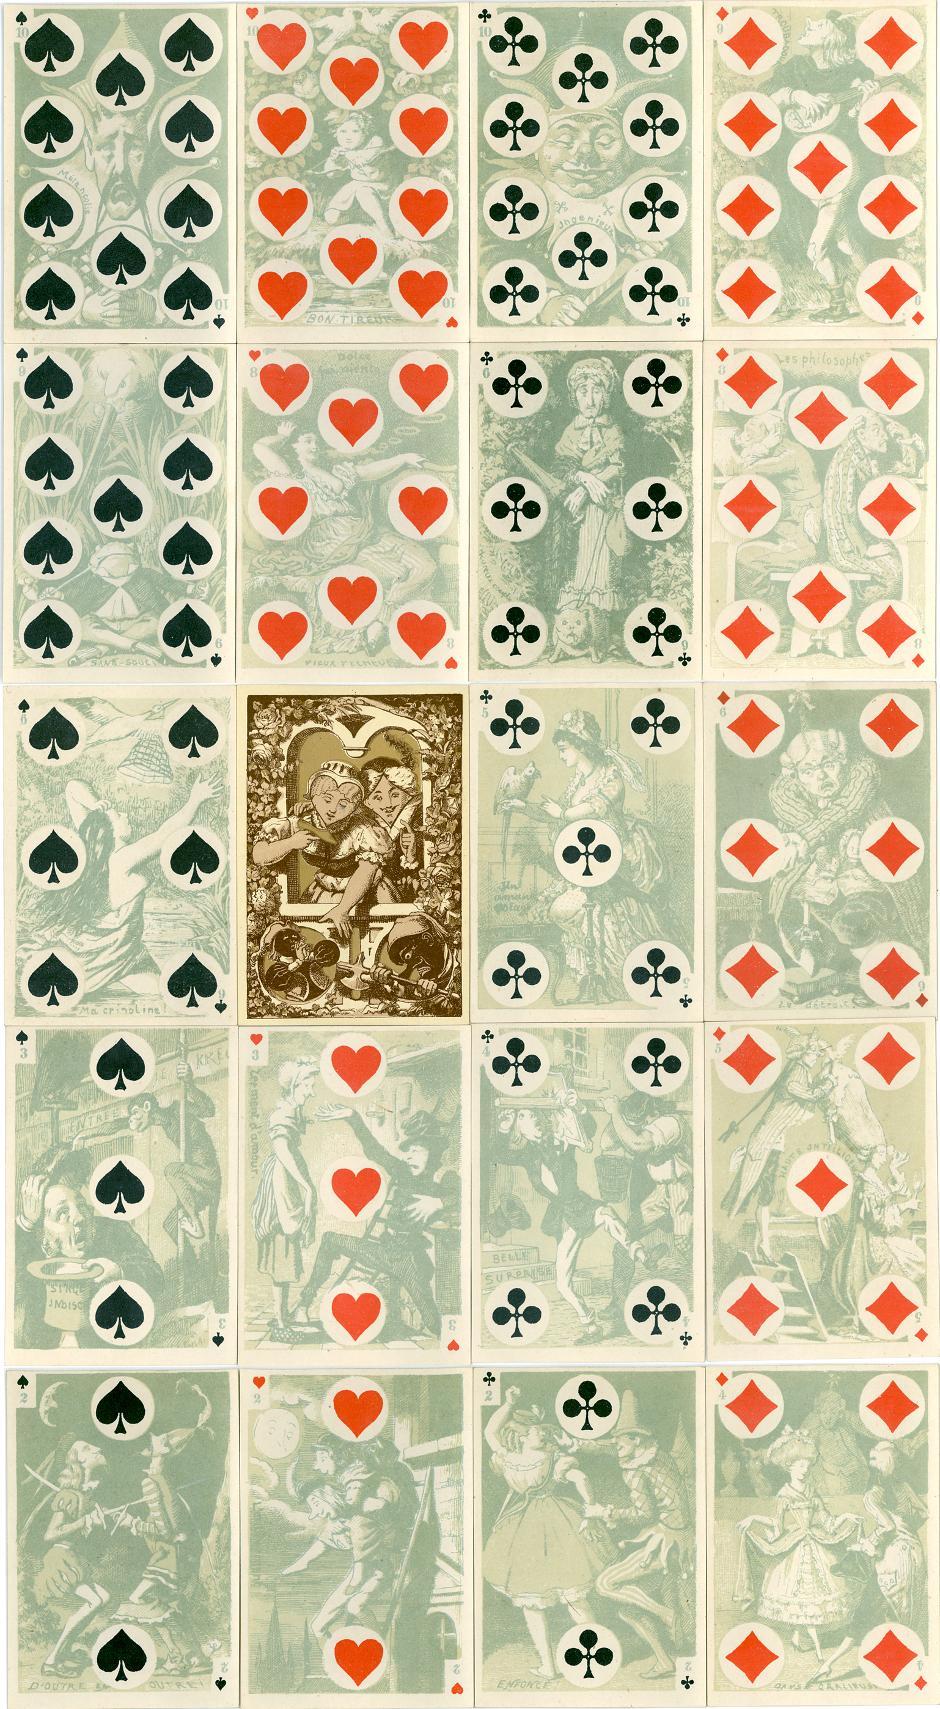 "B. Dondorf: ""Cartes Comiques"" numeral cards, 1870-1888"